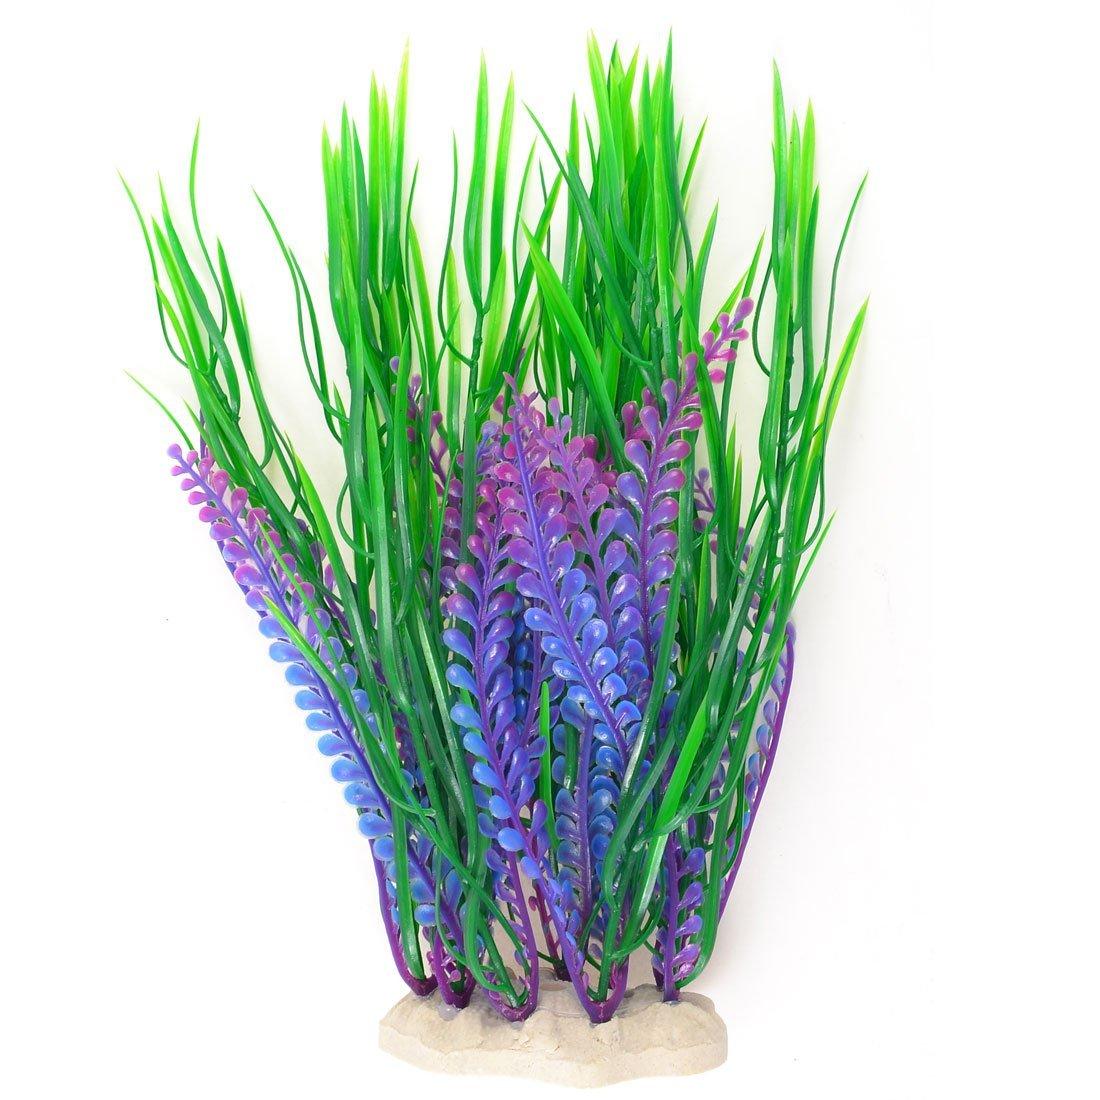 H1 Fish Tank Artificial Water Grass Plants D Cor Green Purple Y7h1 Ebay